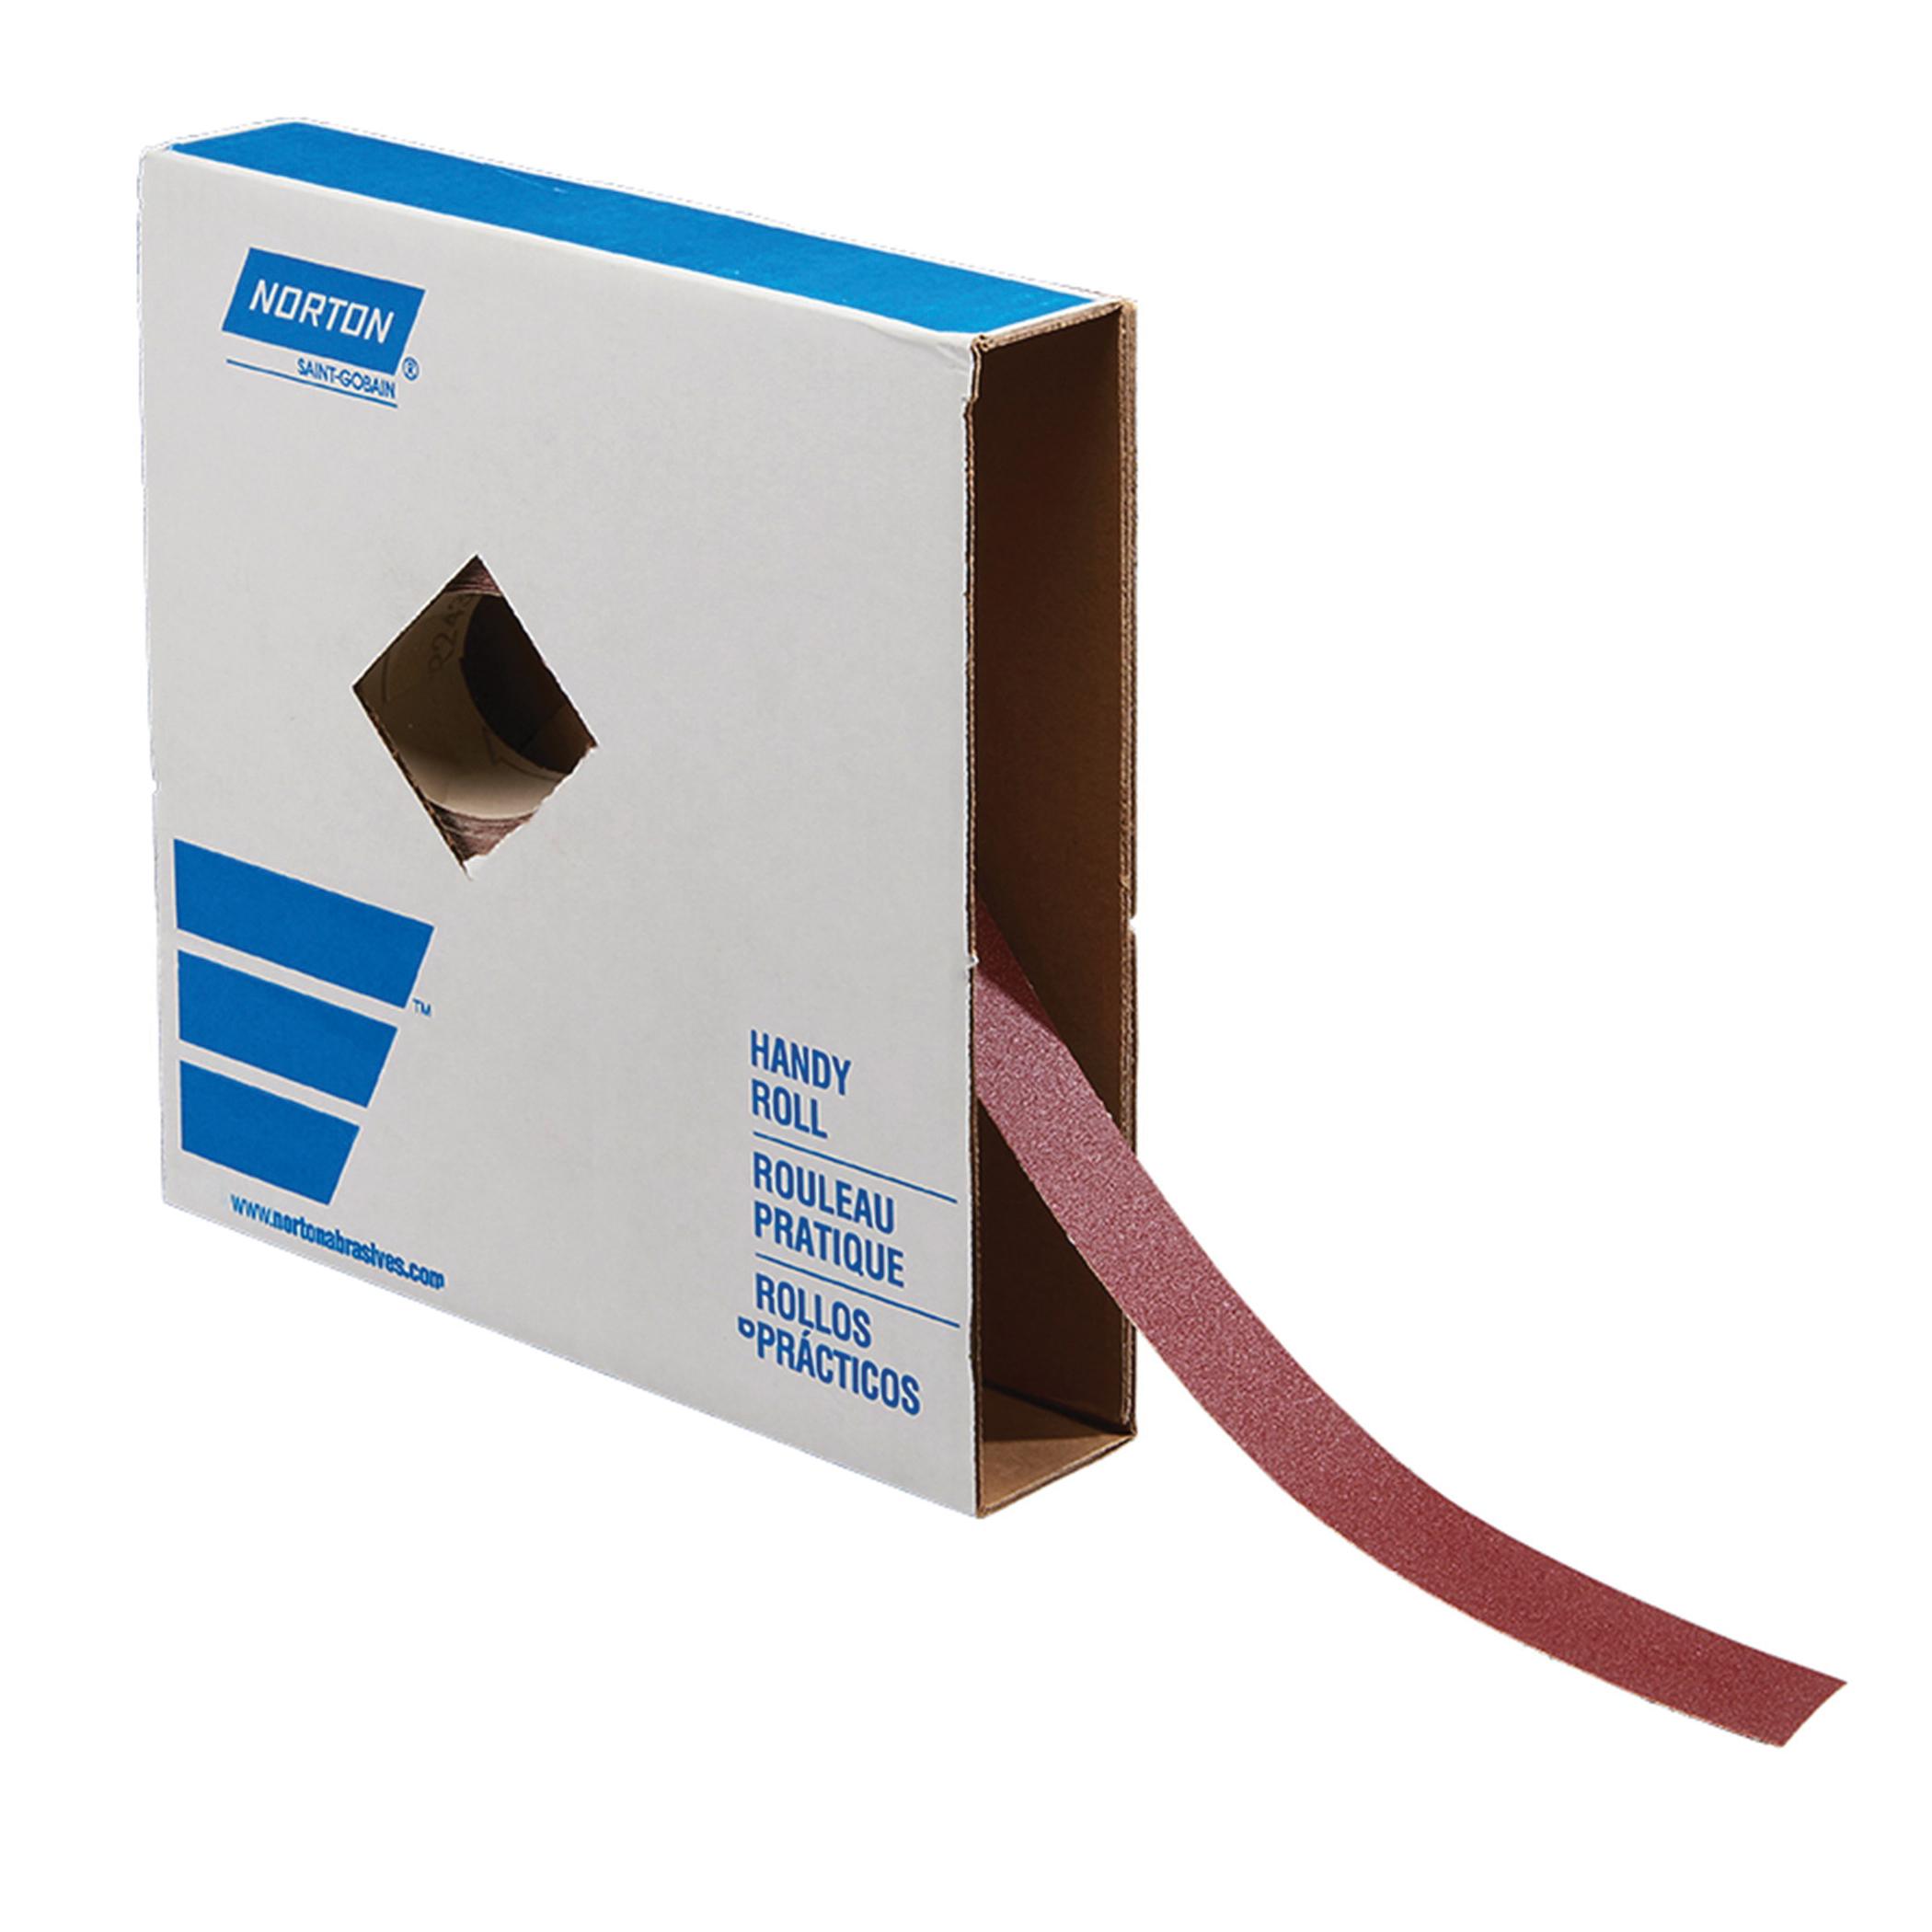 Norton® 66261136199 R243 Coated Abrasive Roll, 50 yd L x 1-1/2 in W, 180 Grit, Fine Grade, Aluminum Oxide Abrasive, Cotton Backing